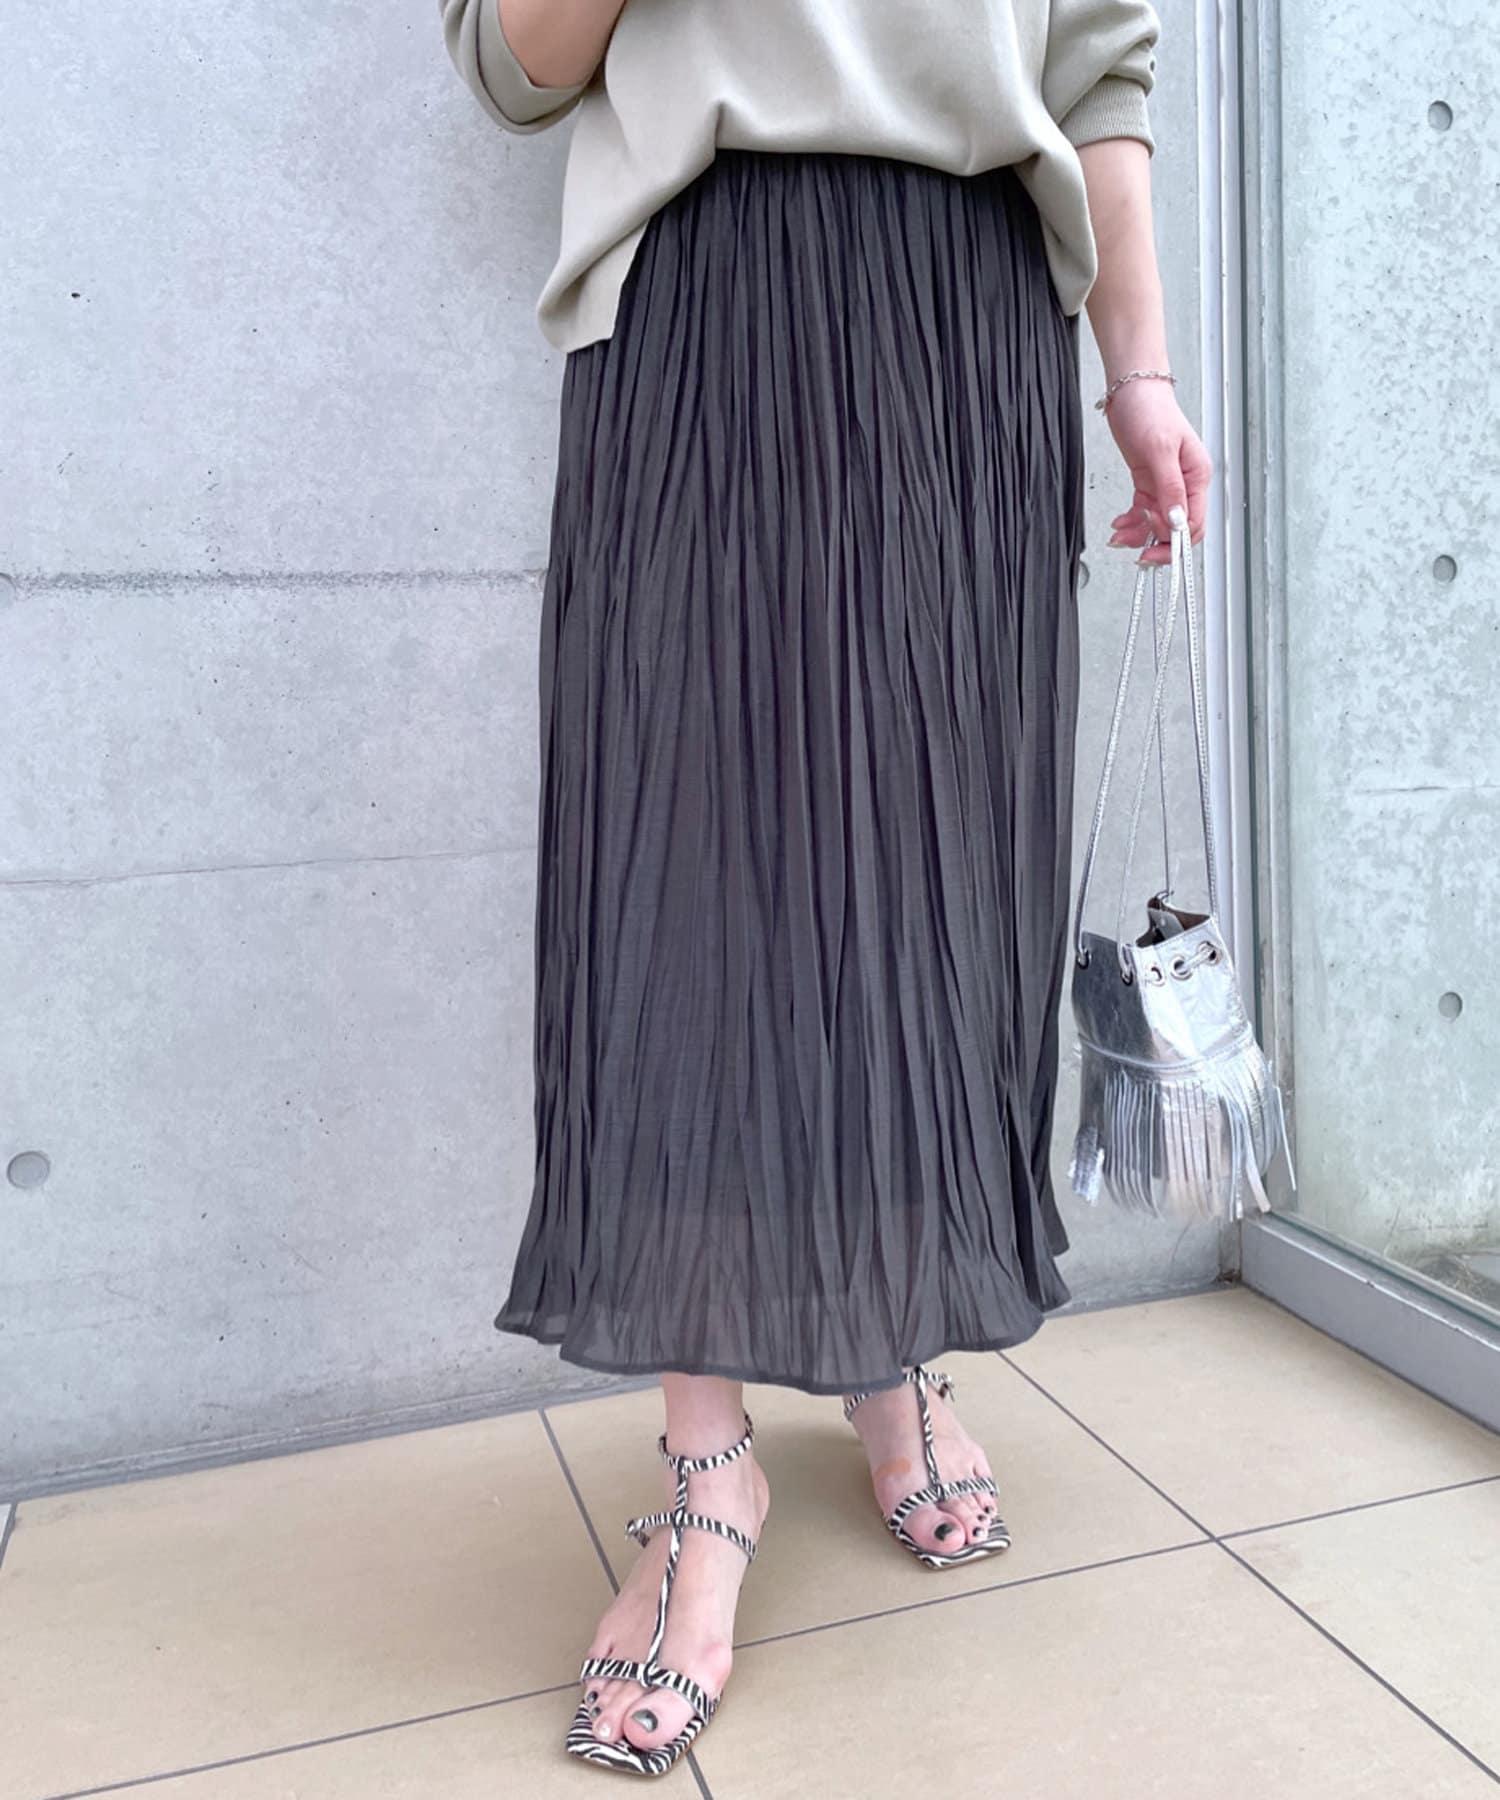 RIVE DROITE(リヴドロワ) 【上品な光沢感が魅力】エスパンディープリーツスカート